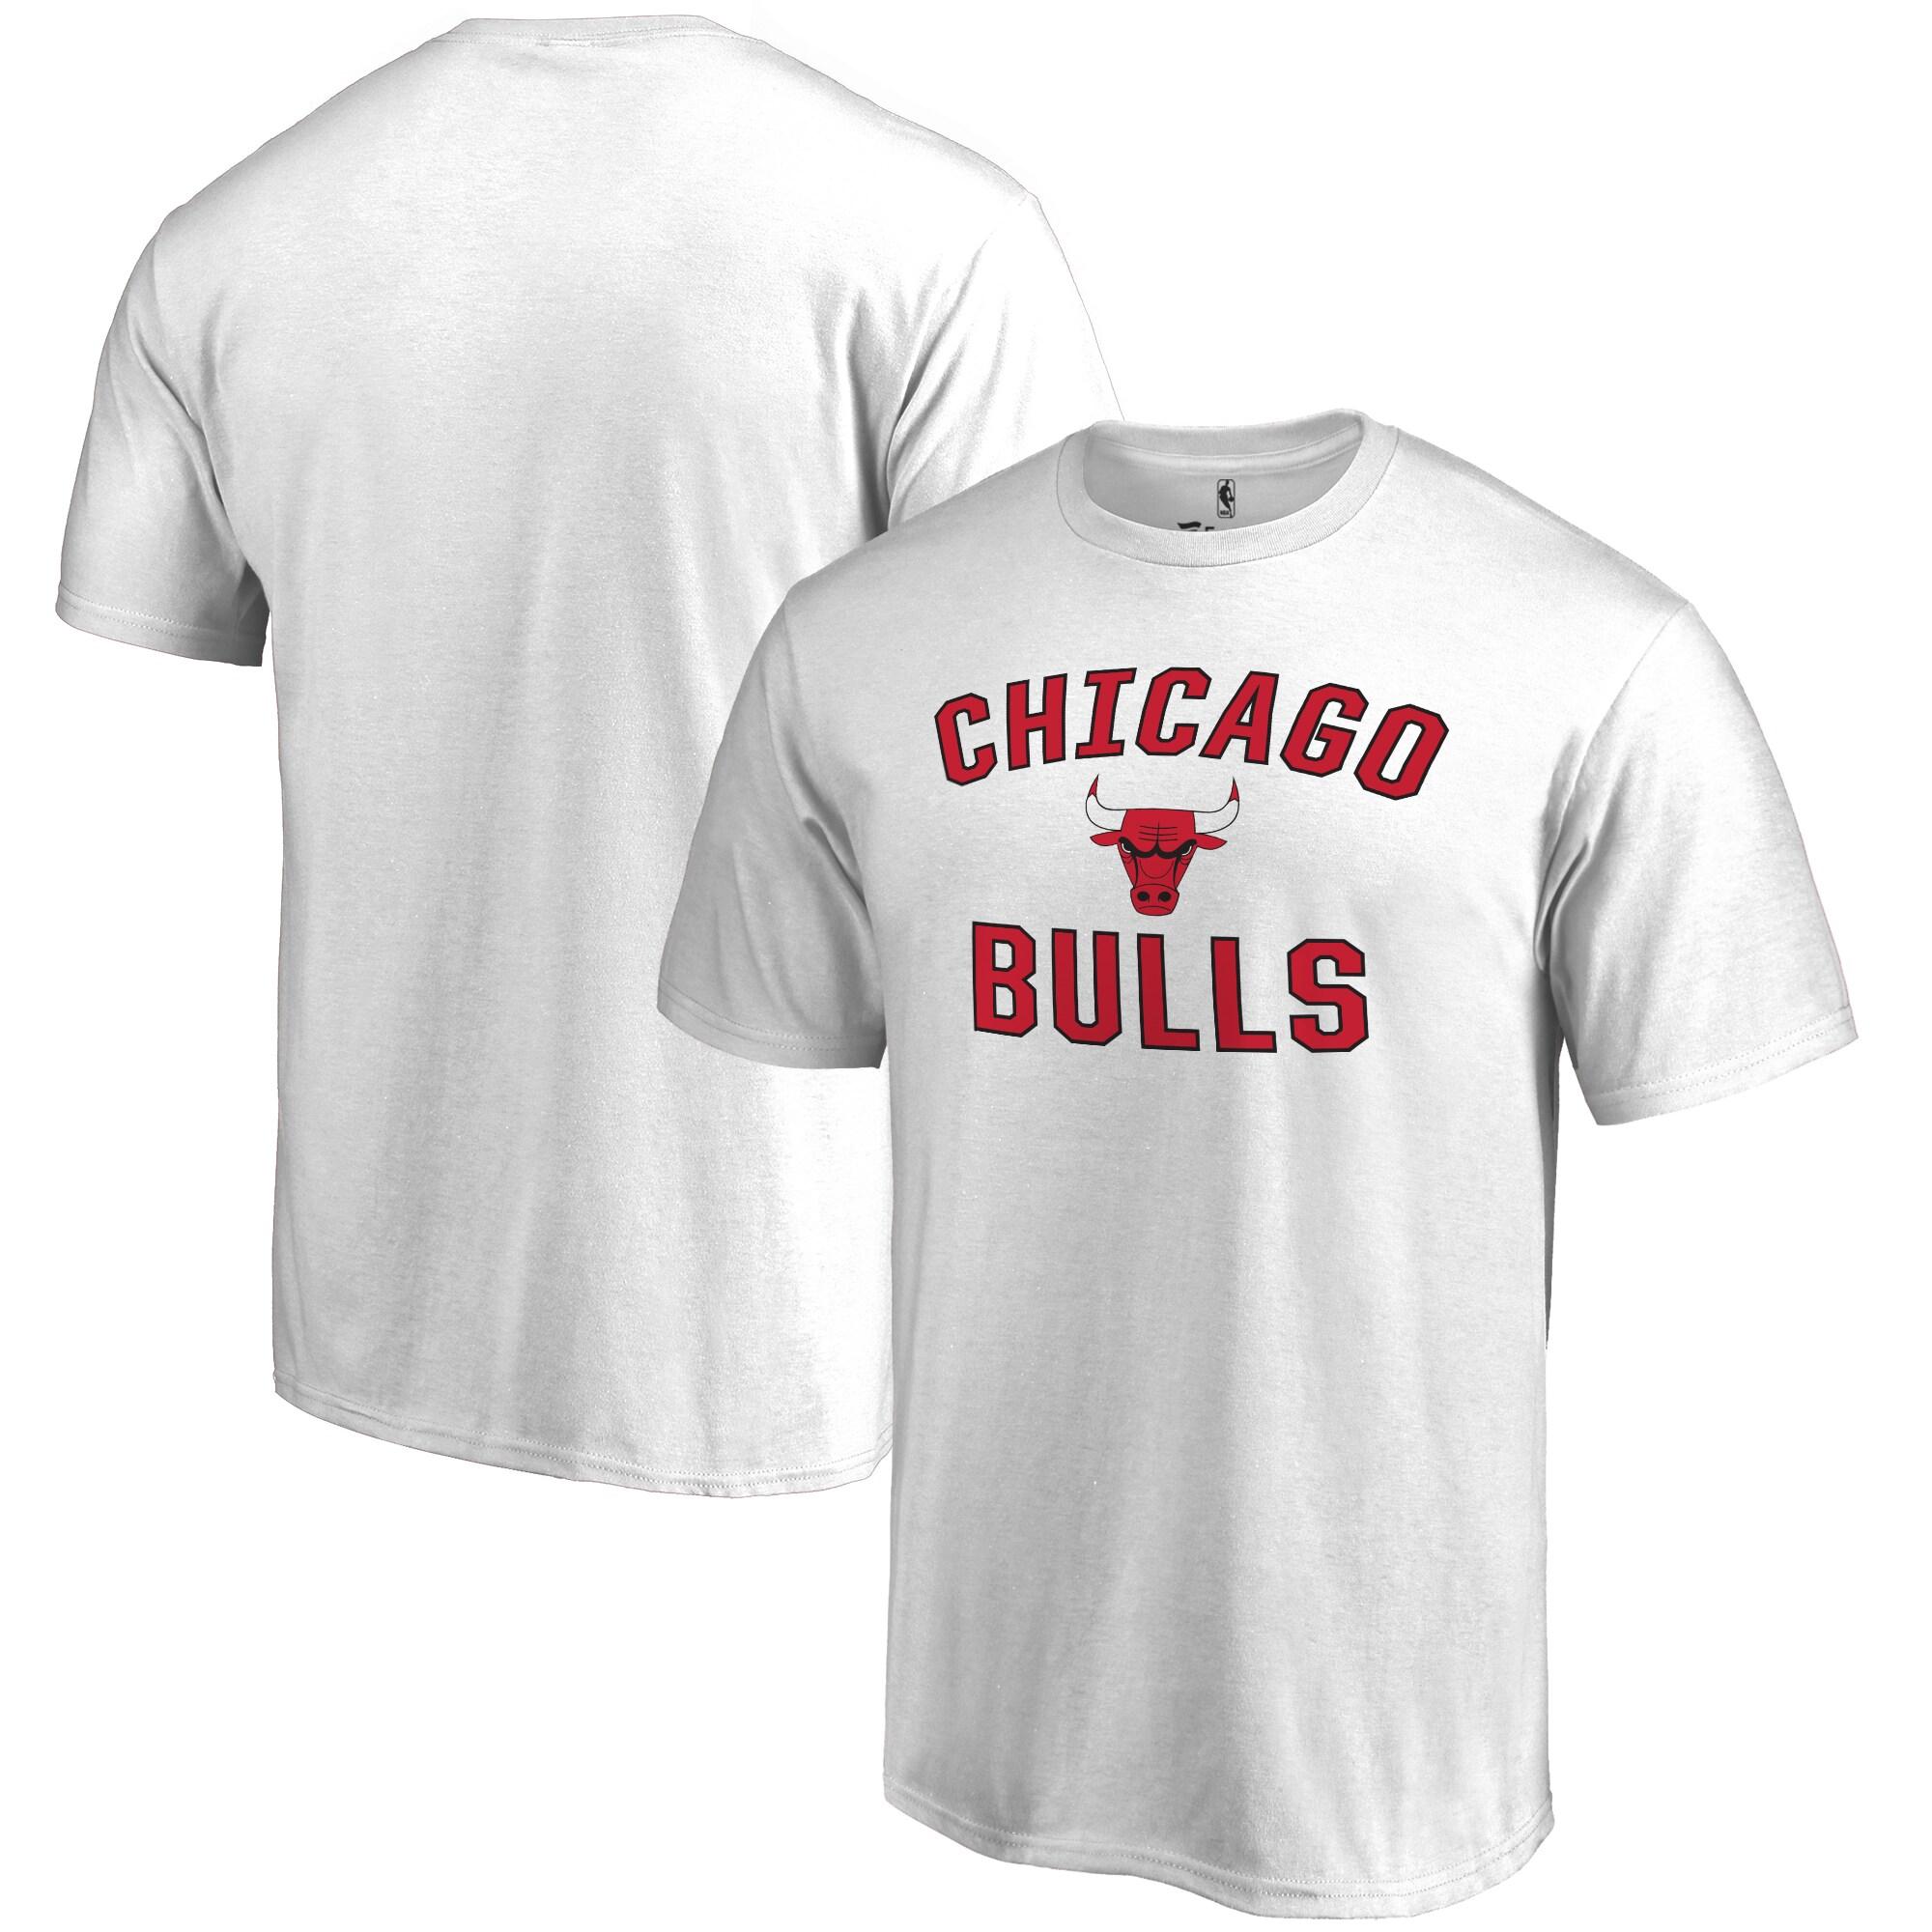 Chicago Bulls Big & Tall Victory Arch T-Shirt - White